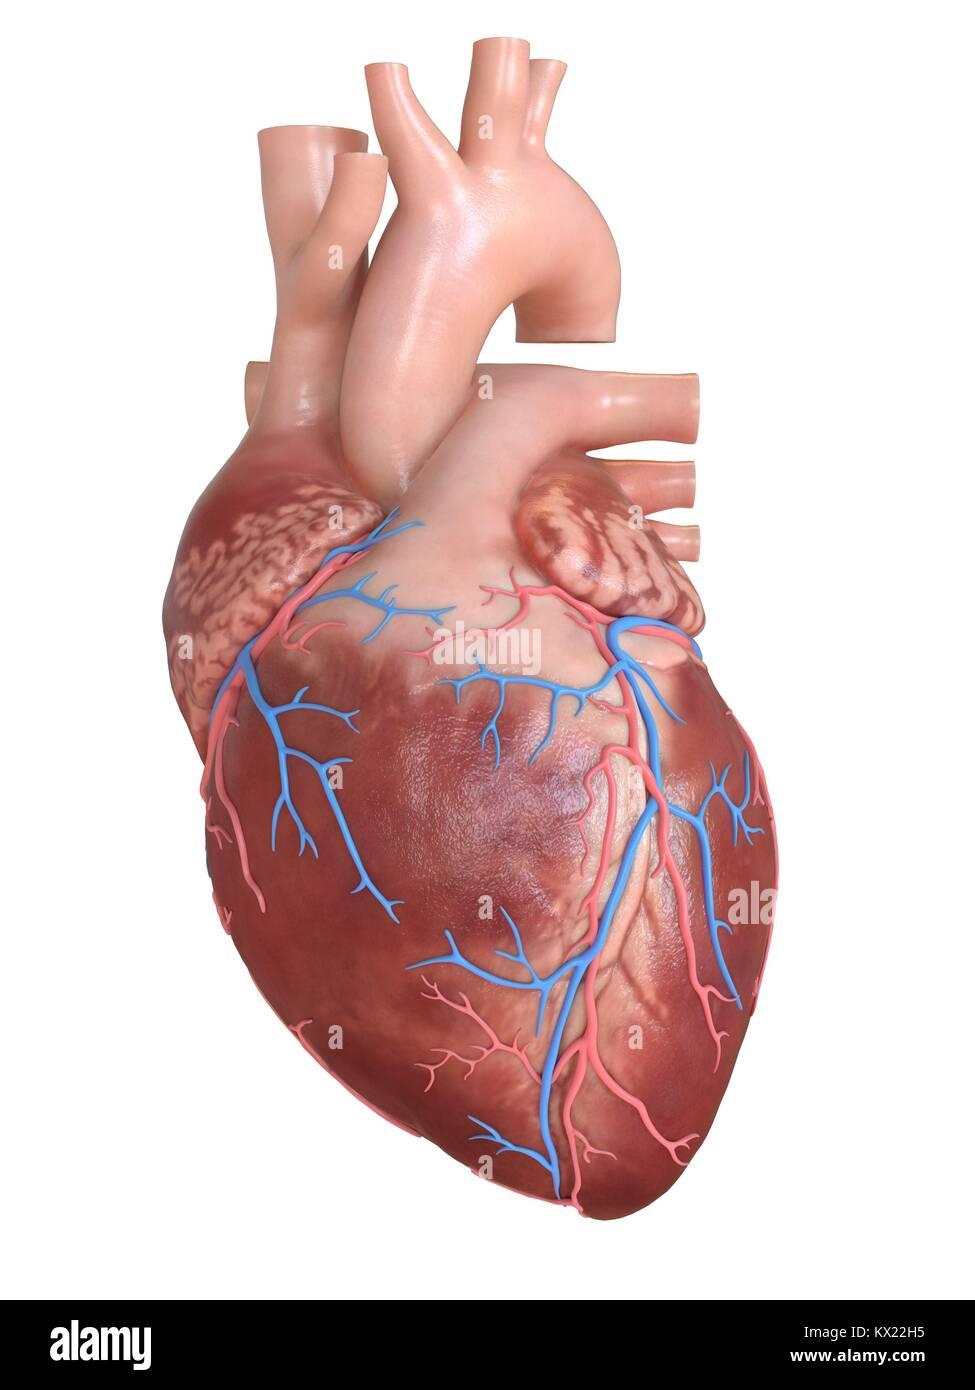 Human Heart With Coronary Veins Illustration Stock Photo 170920321